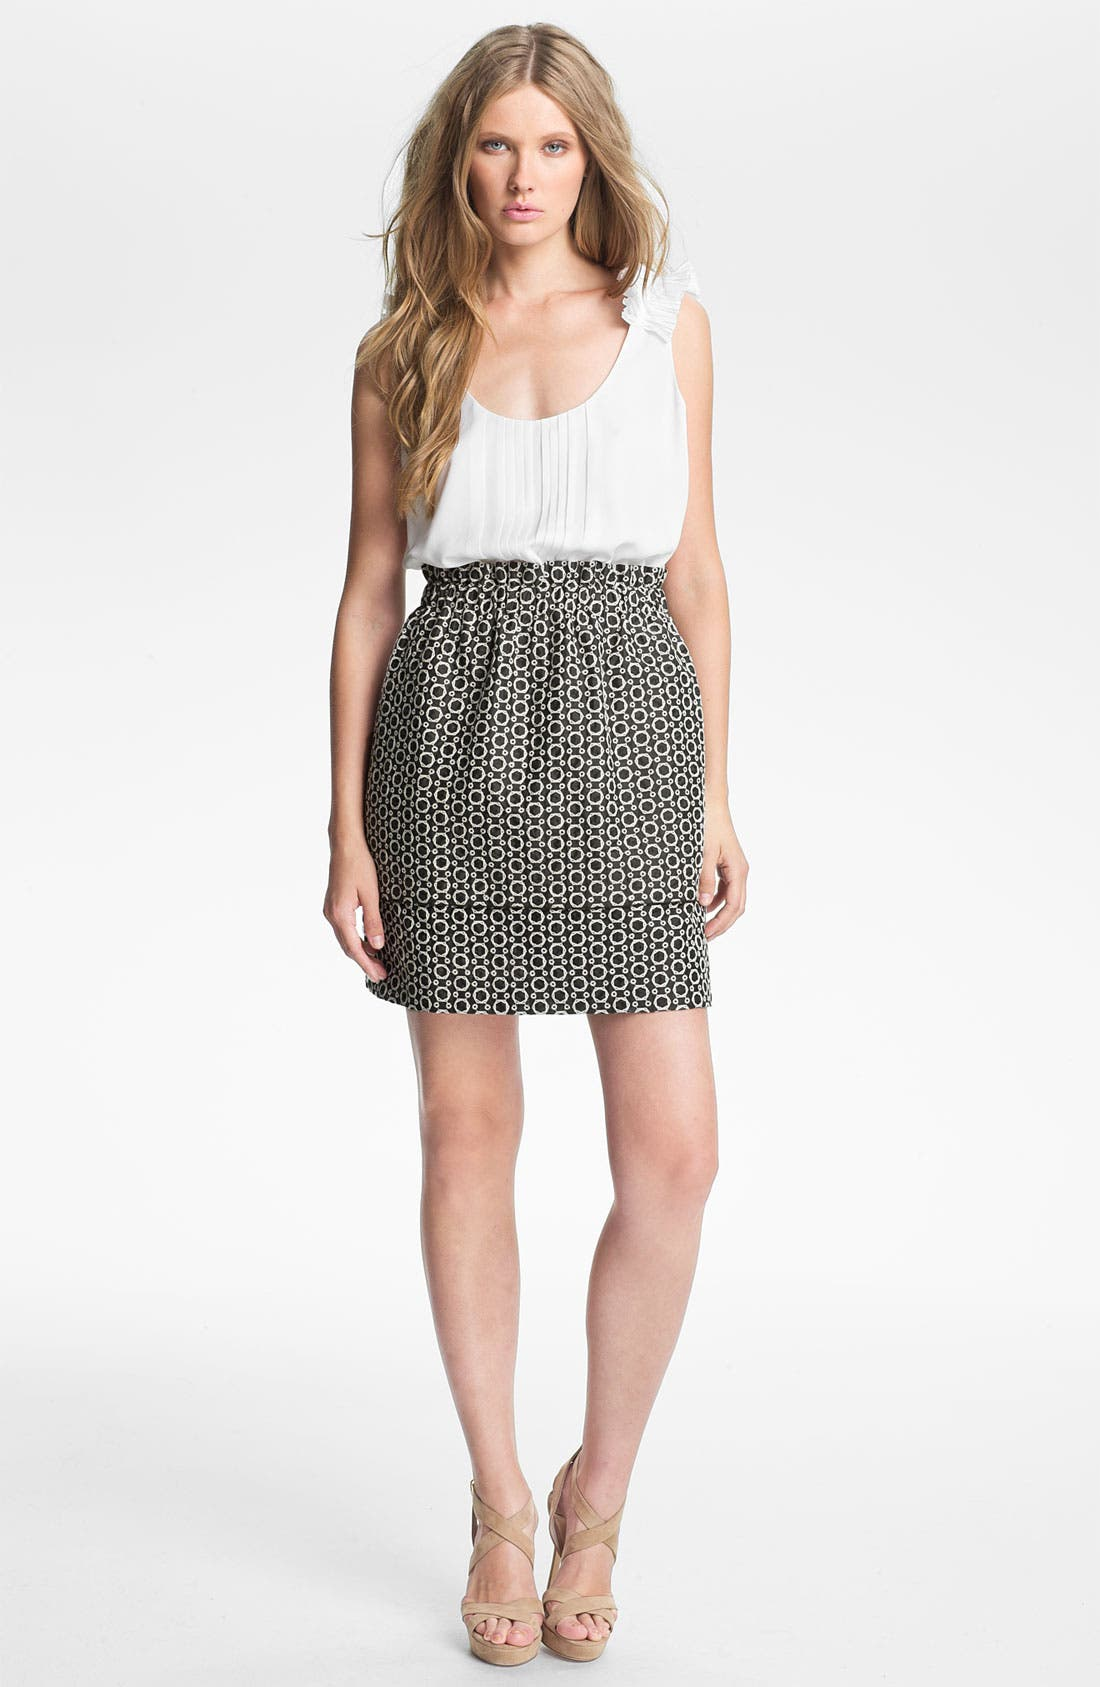 Alternate Image 1 Selected - Mcginn 'Laryn' Sleeveless Dress